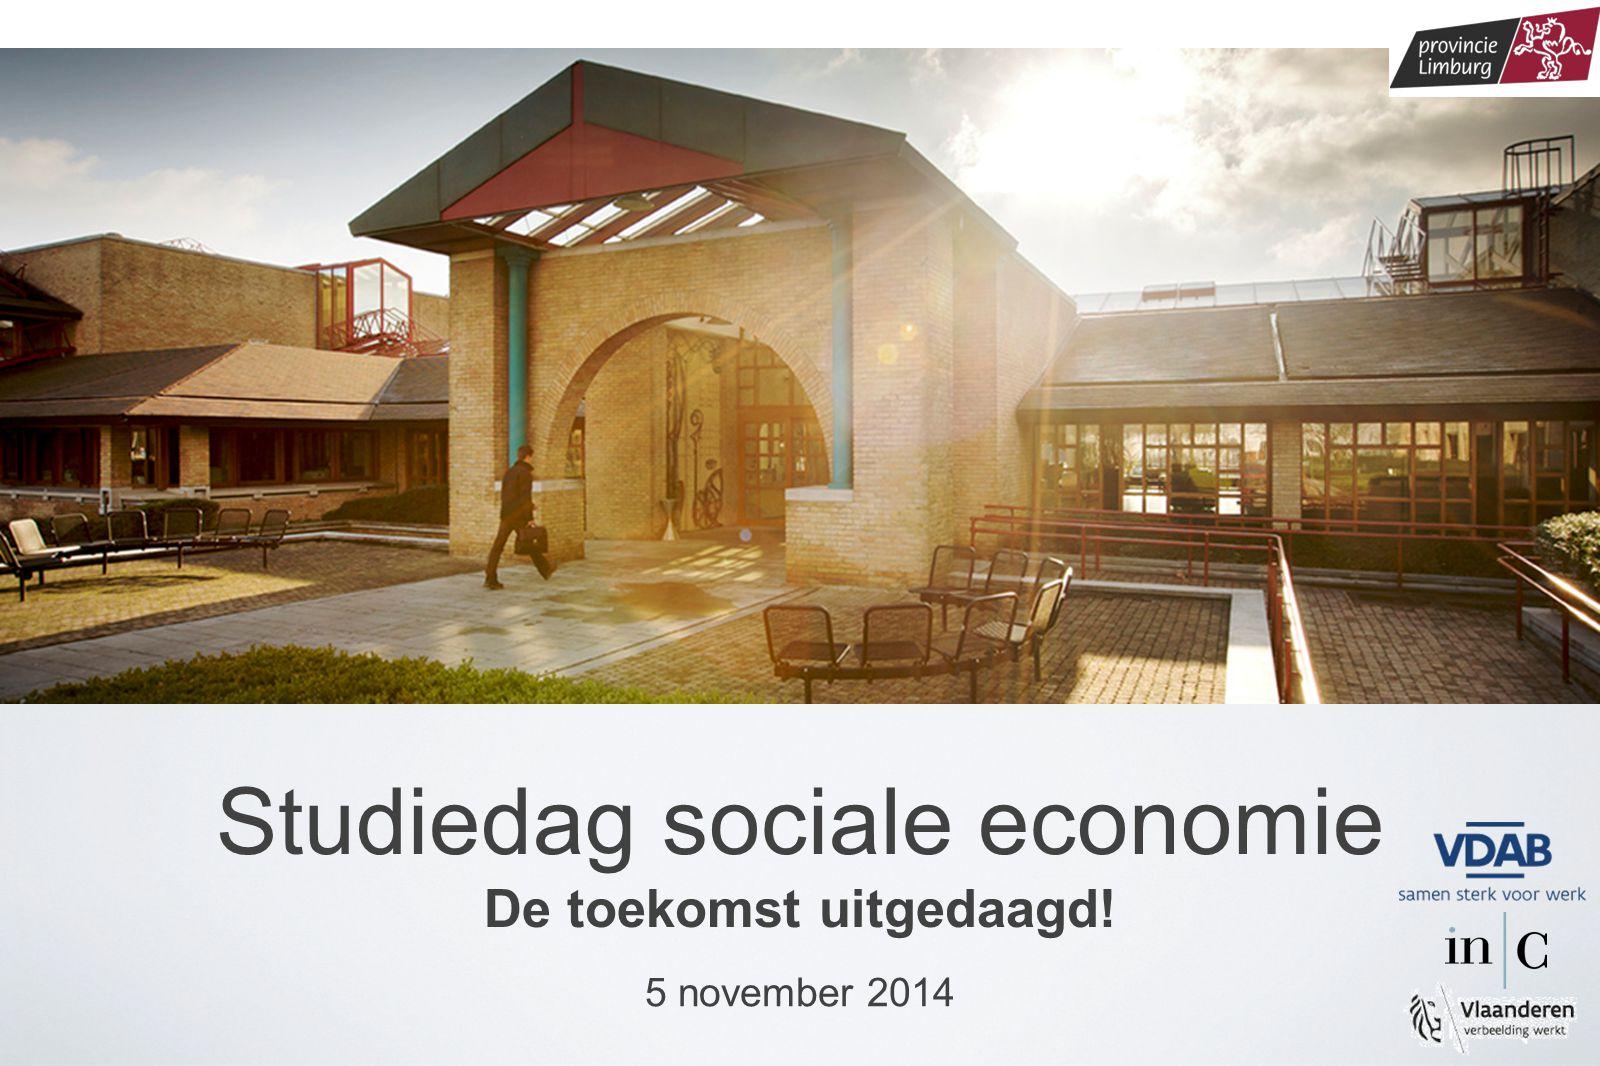 limburg.be Studiedag sociale economie De toekomst uitgedaagd! 5 november 2014